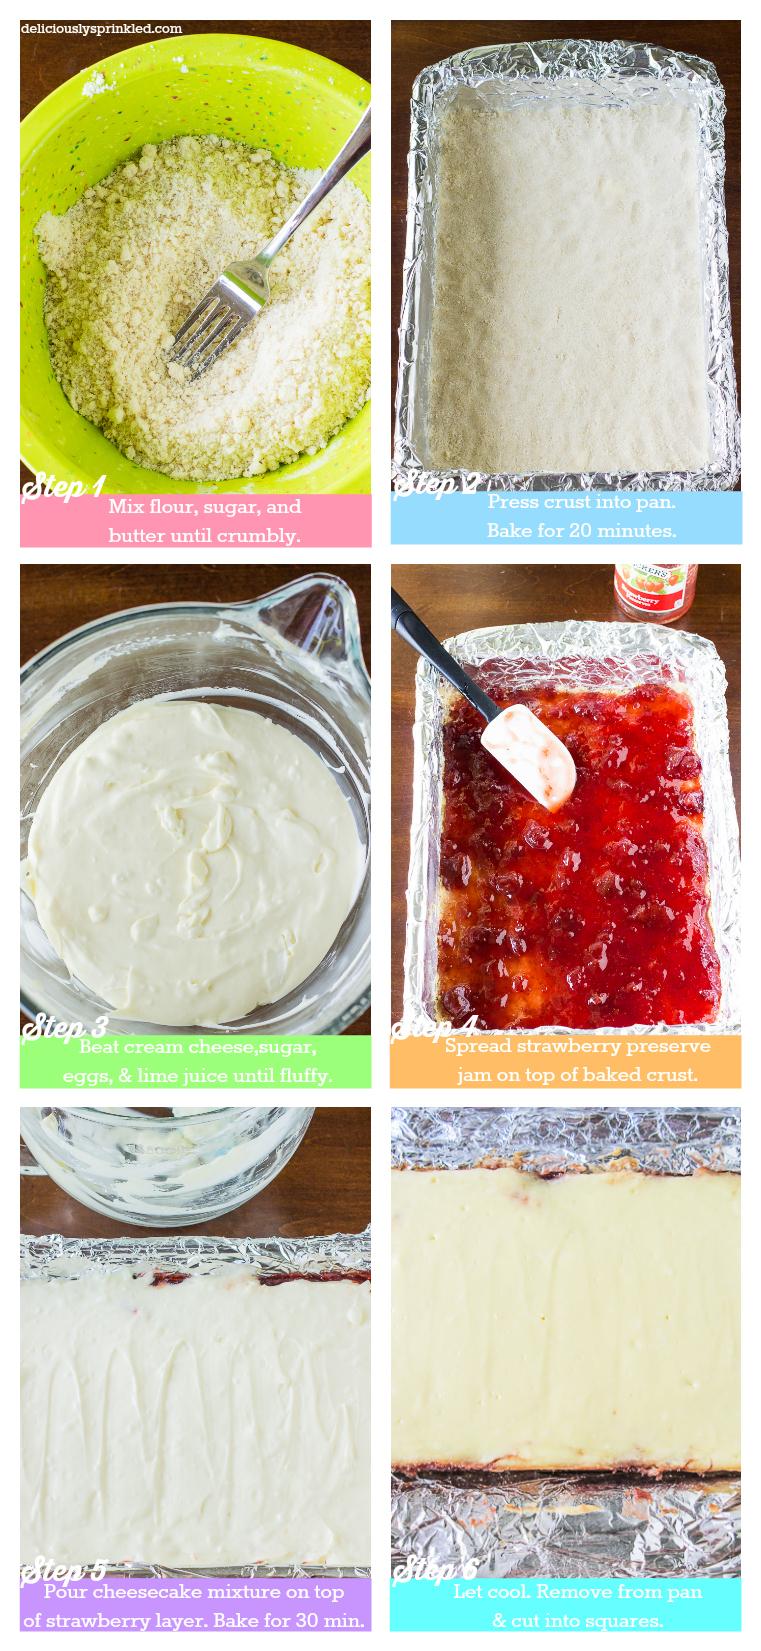 How to Make Strawberry Cheesecake Recipe